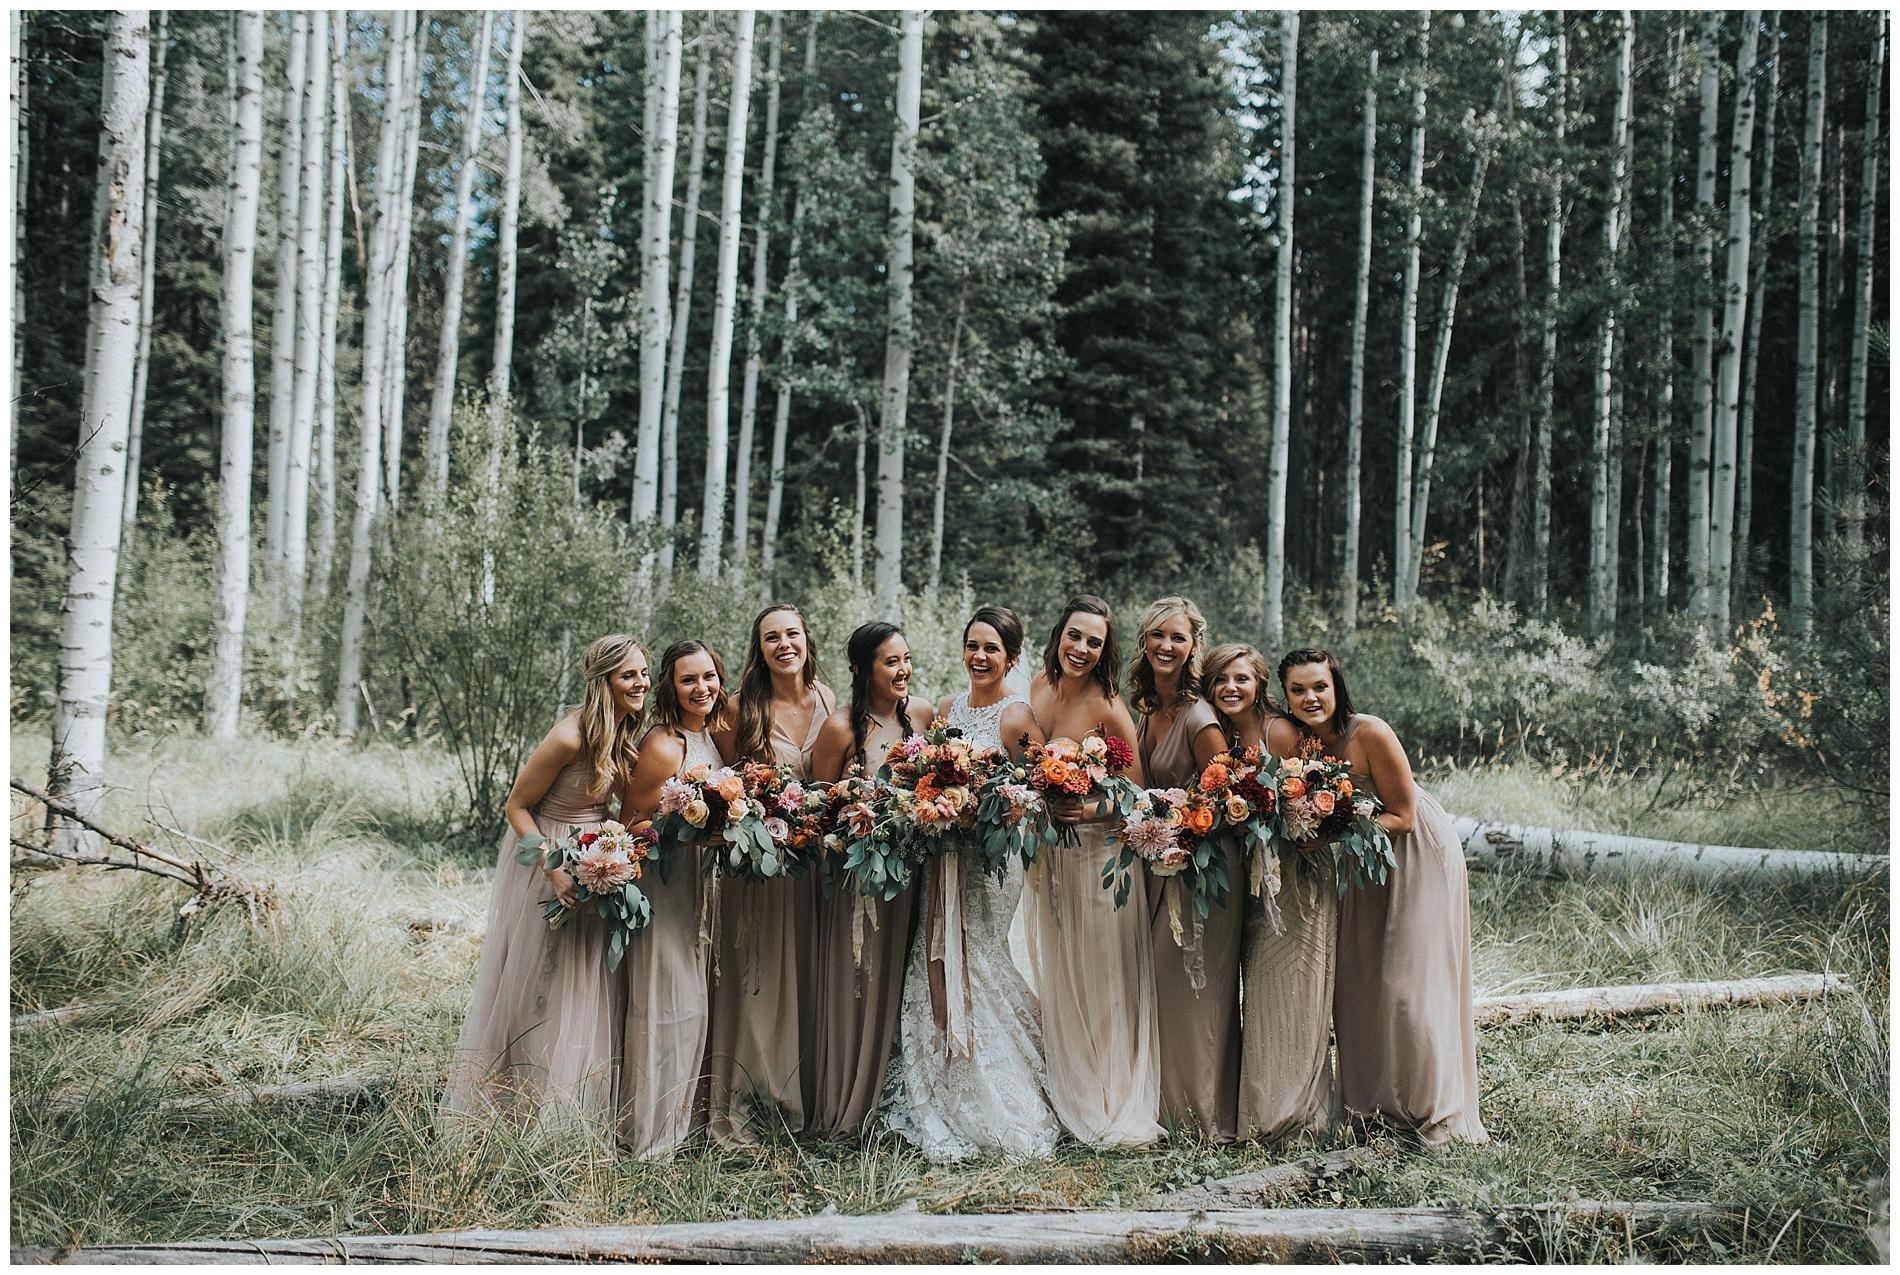 Boho Bridesmaids McCall Idaho